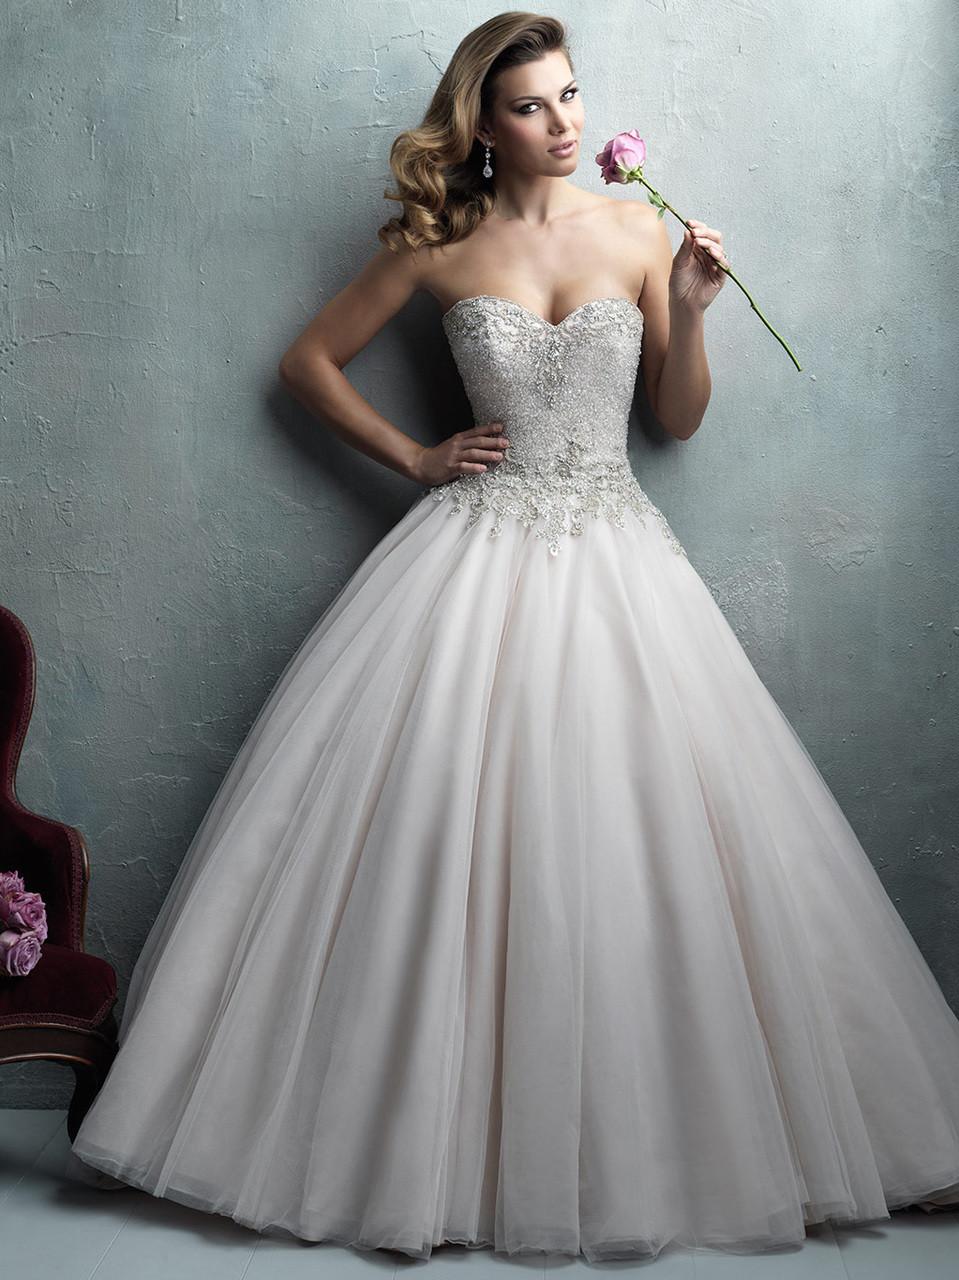 Crystal Embroidered Wedding Dress